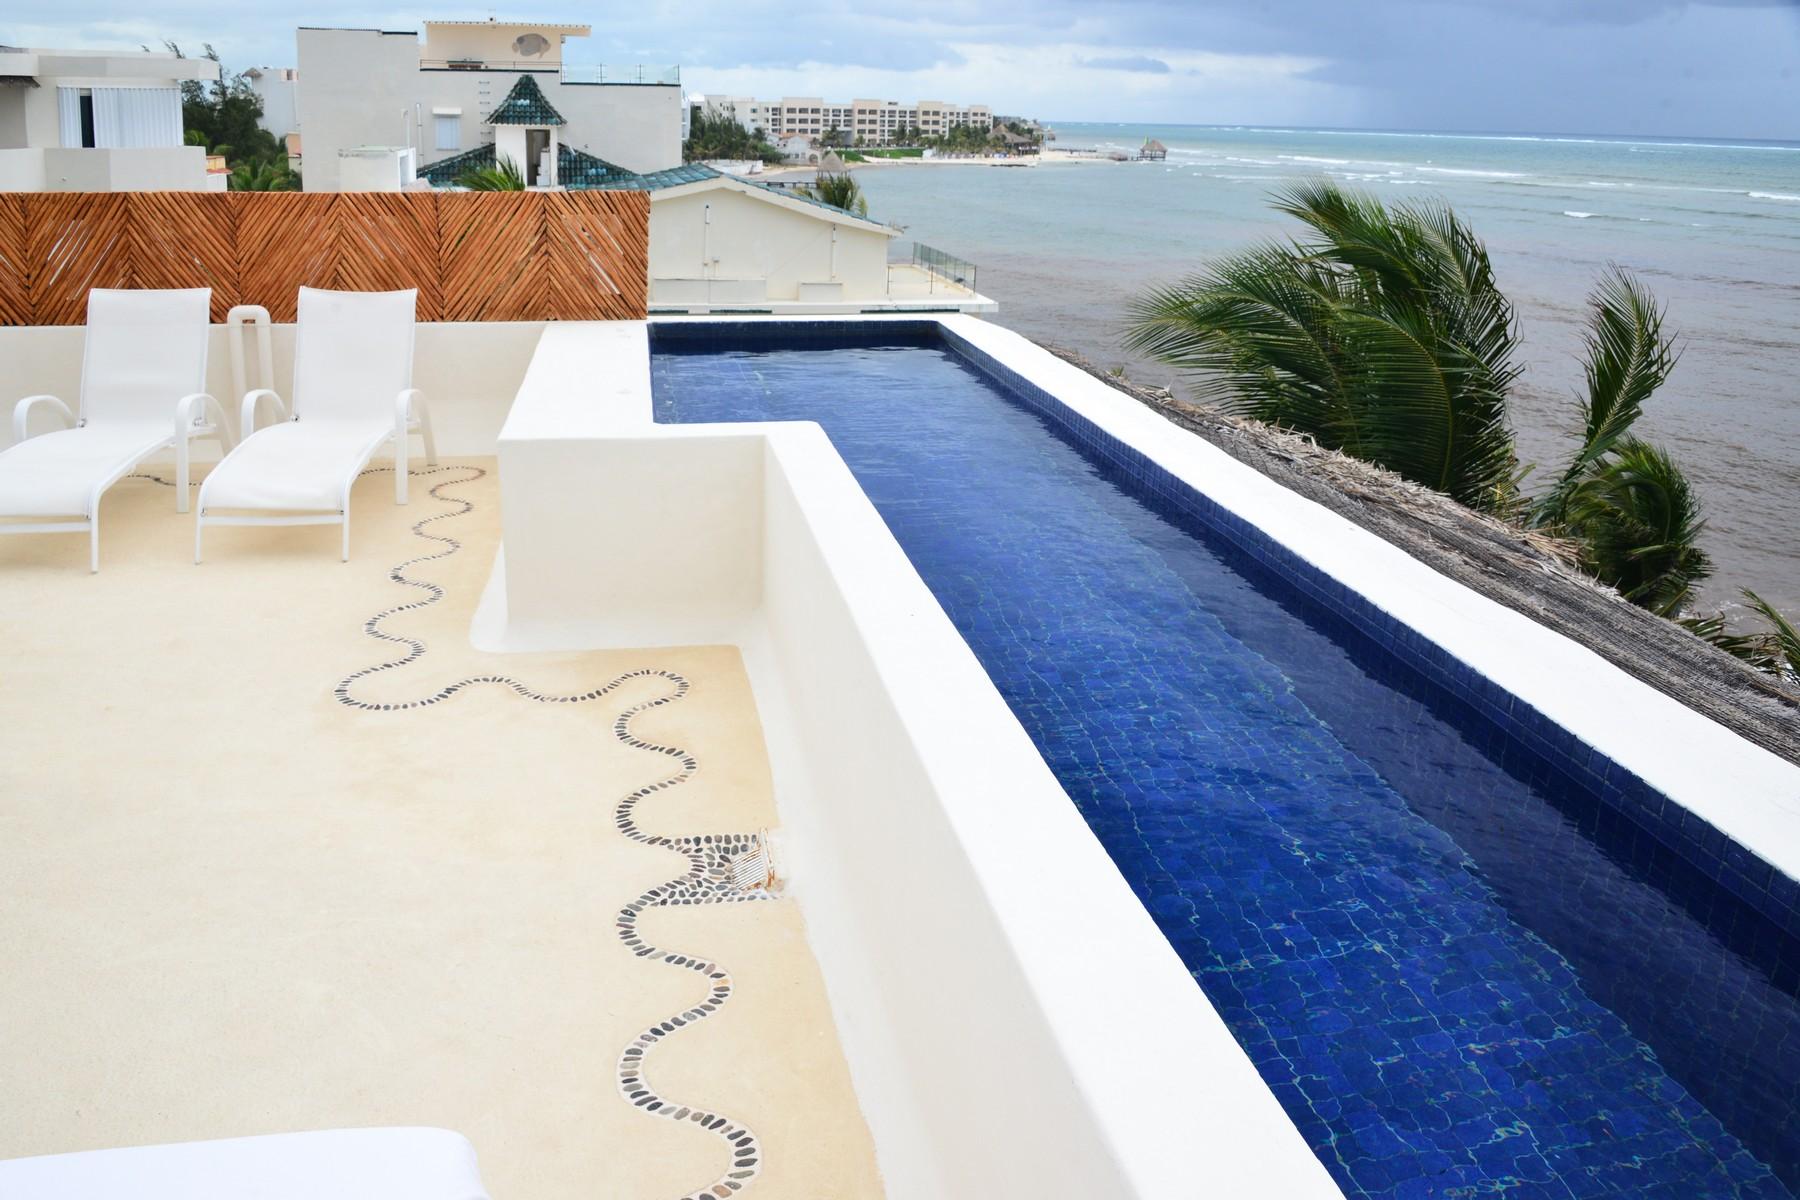 Apartment for Sale at SEAFRONT PARADISE PENTHOUSE Seafront Paradise Penthouse Predio Maria Irene, Supermzna 12, Mzna 21 13 Puerto Morelos, Quintana Roo 77930 Mexico